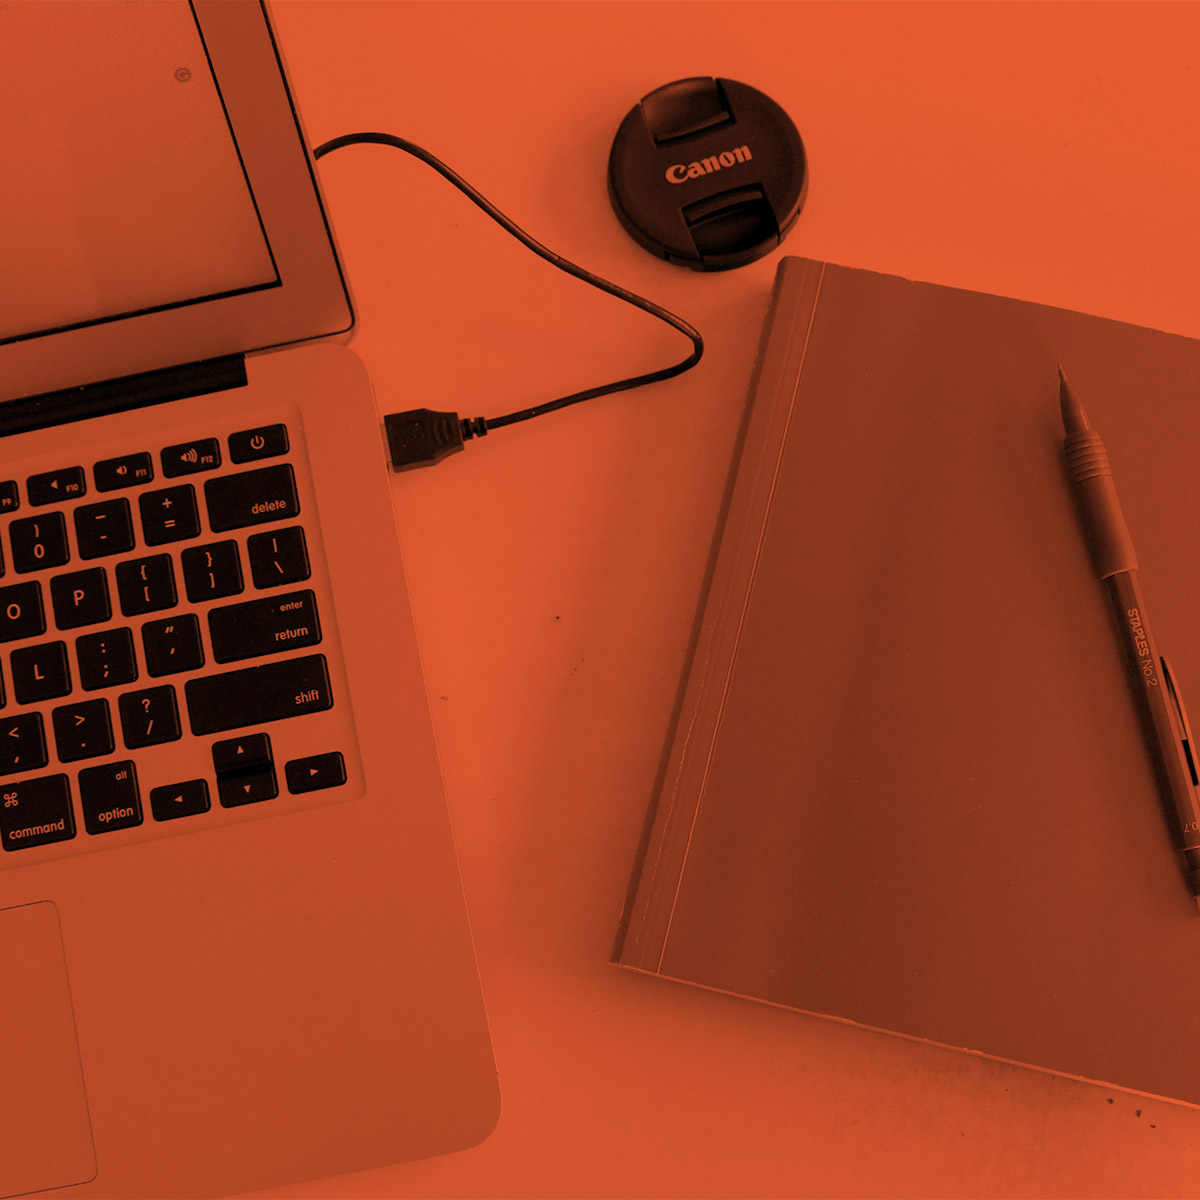 computer-and-sketchbook-orange-square